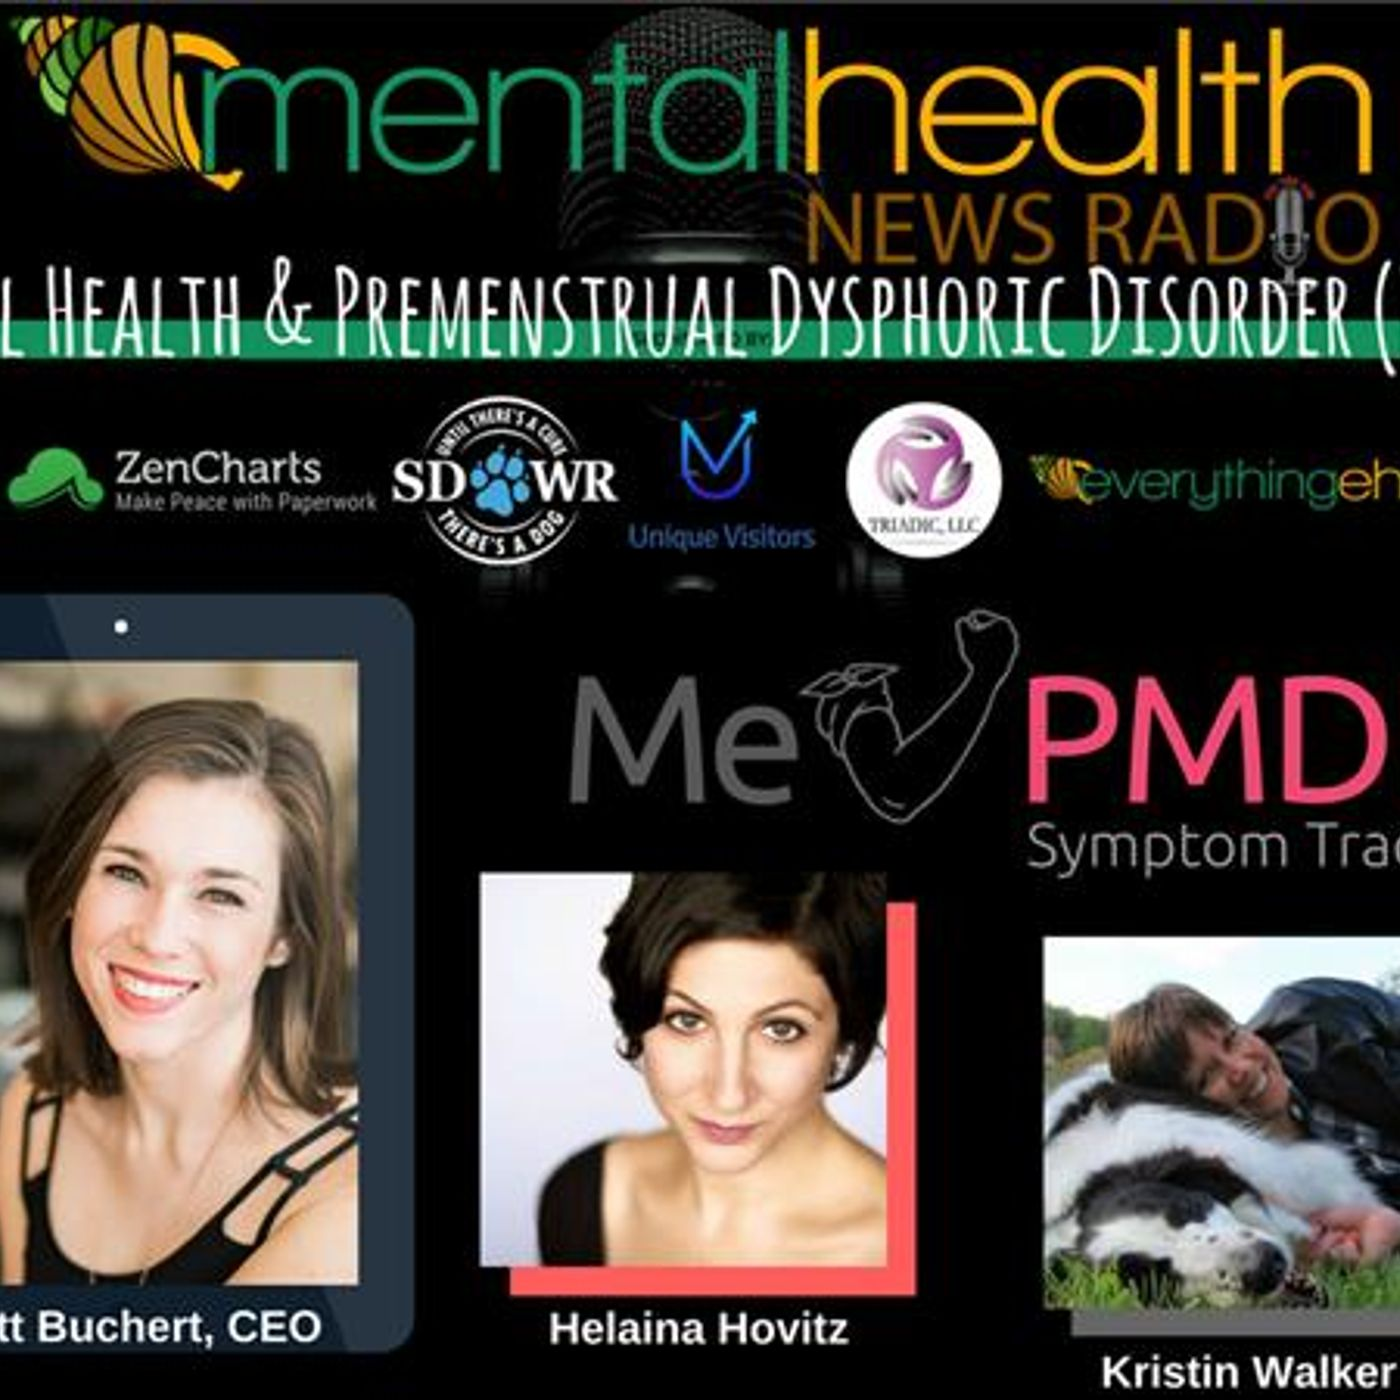 Mental Health News Radio - Mental Health & Premenstrual Dysphoric Disorder (PMDD) with Brett Buchert